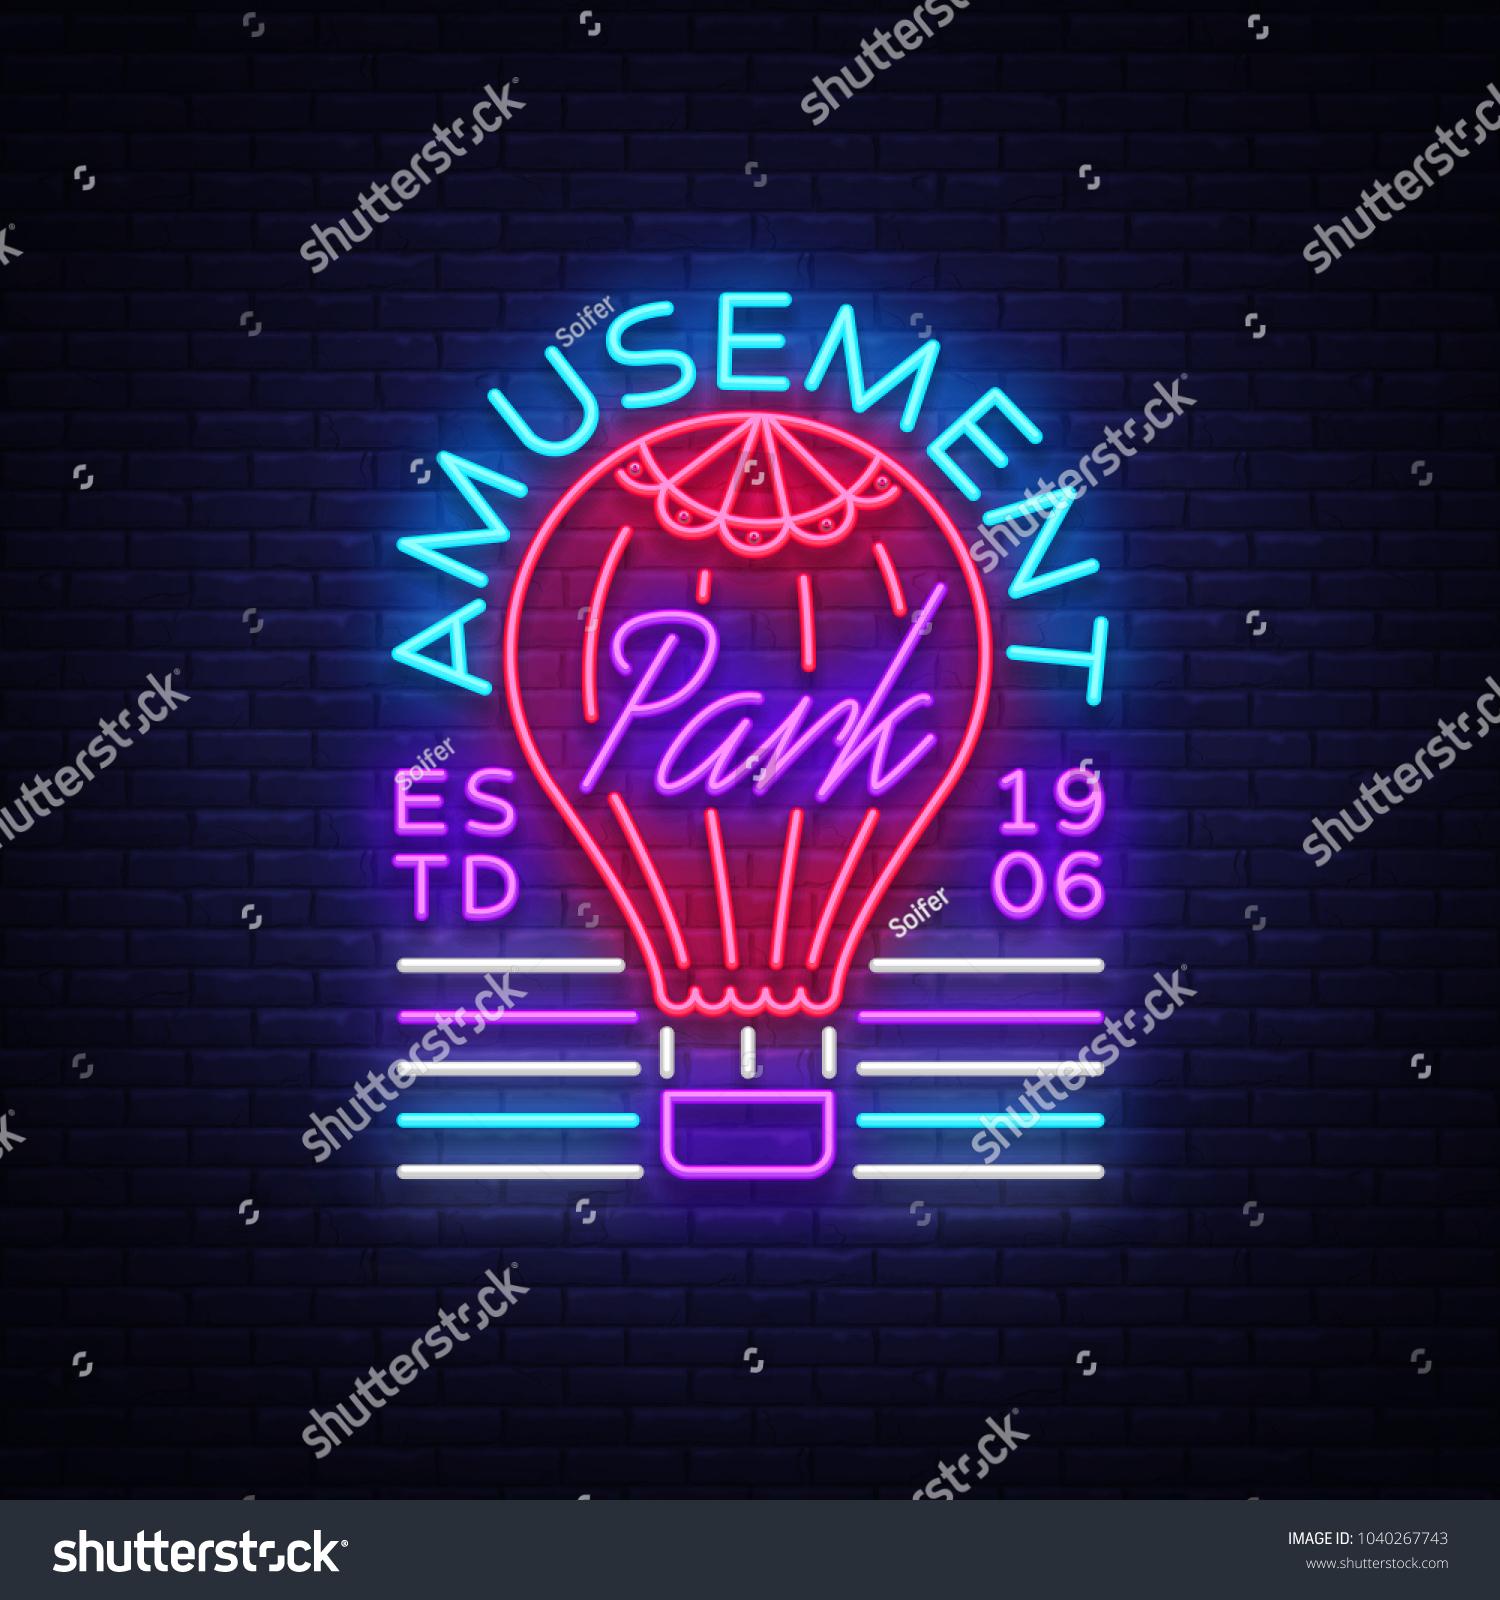 Amusement Park Logo Neon Style Design Stock Vector Royalty Free 1040267743